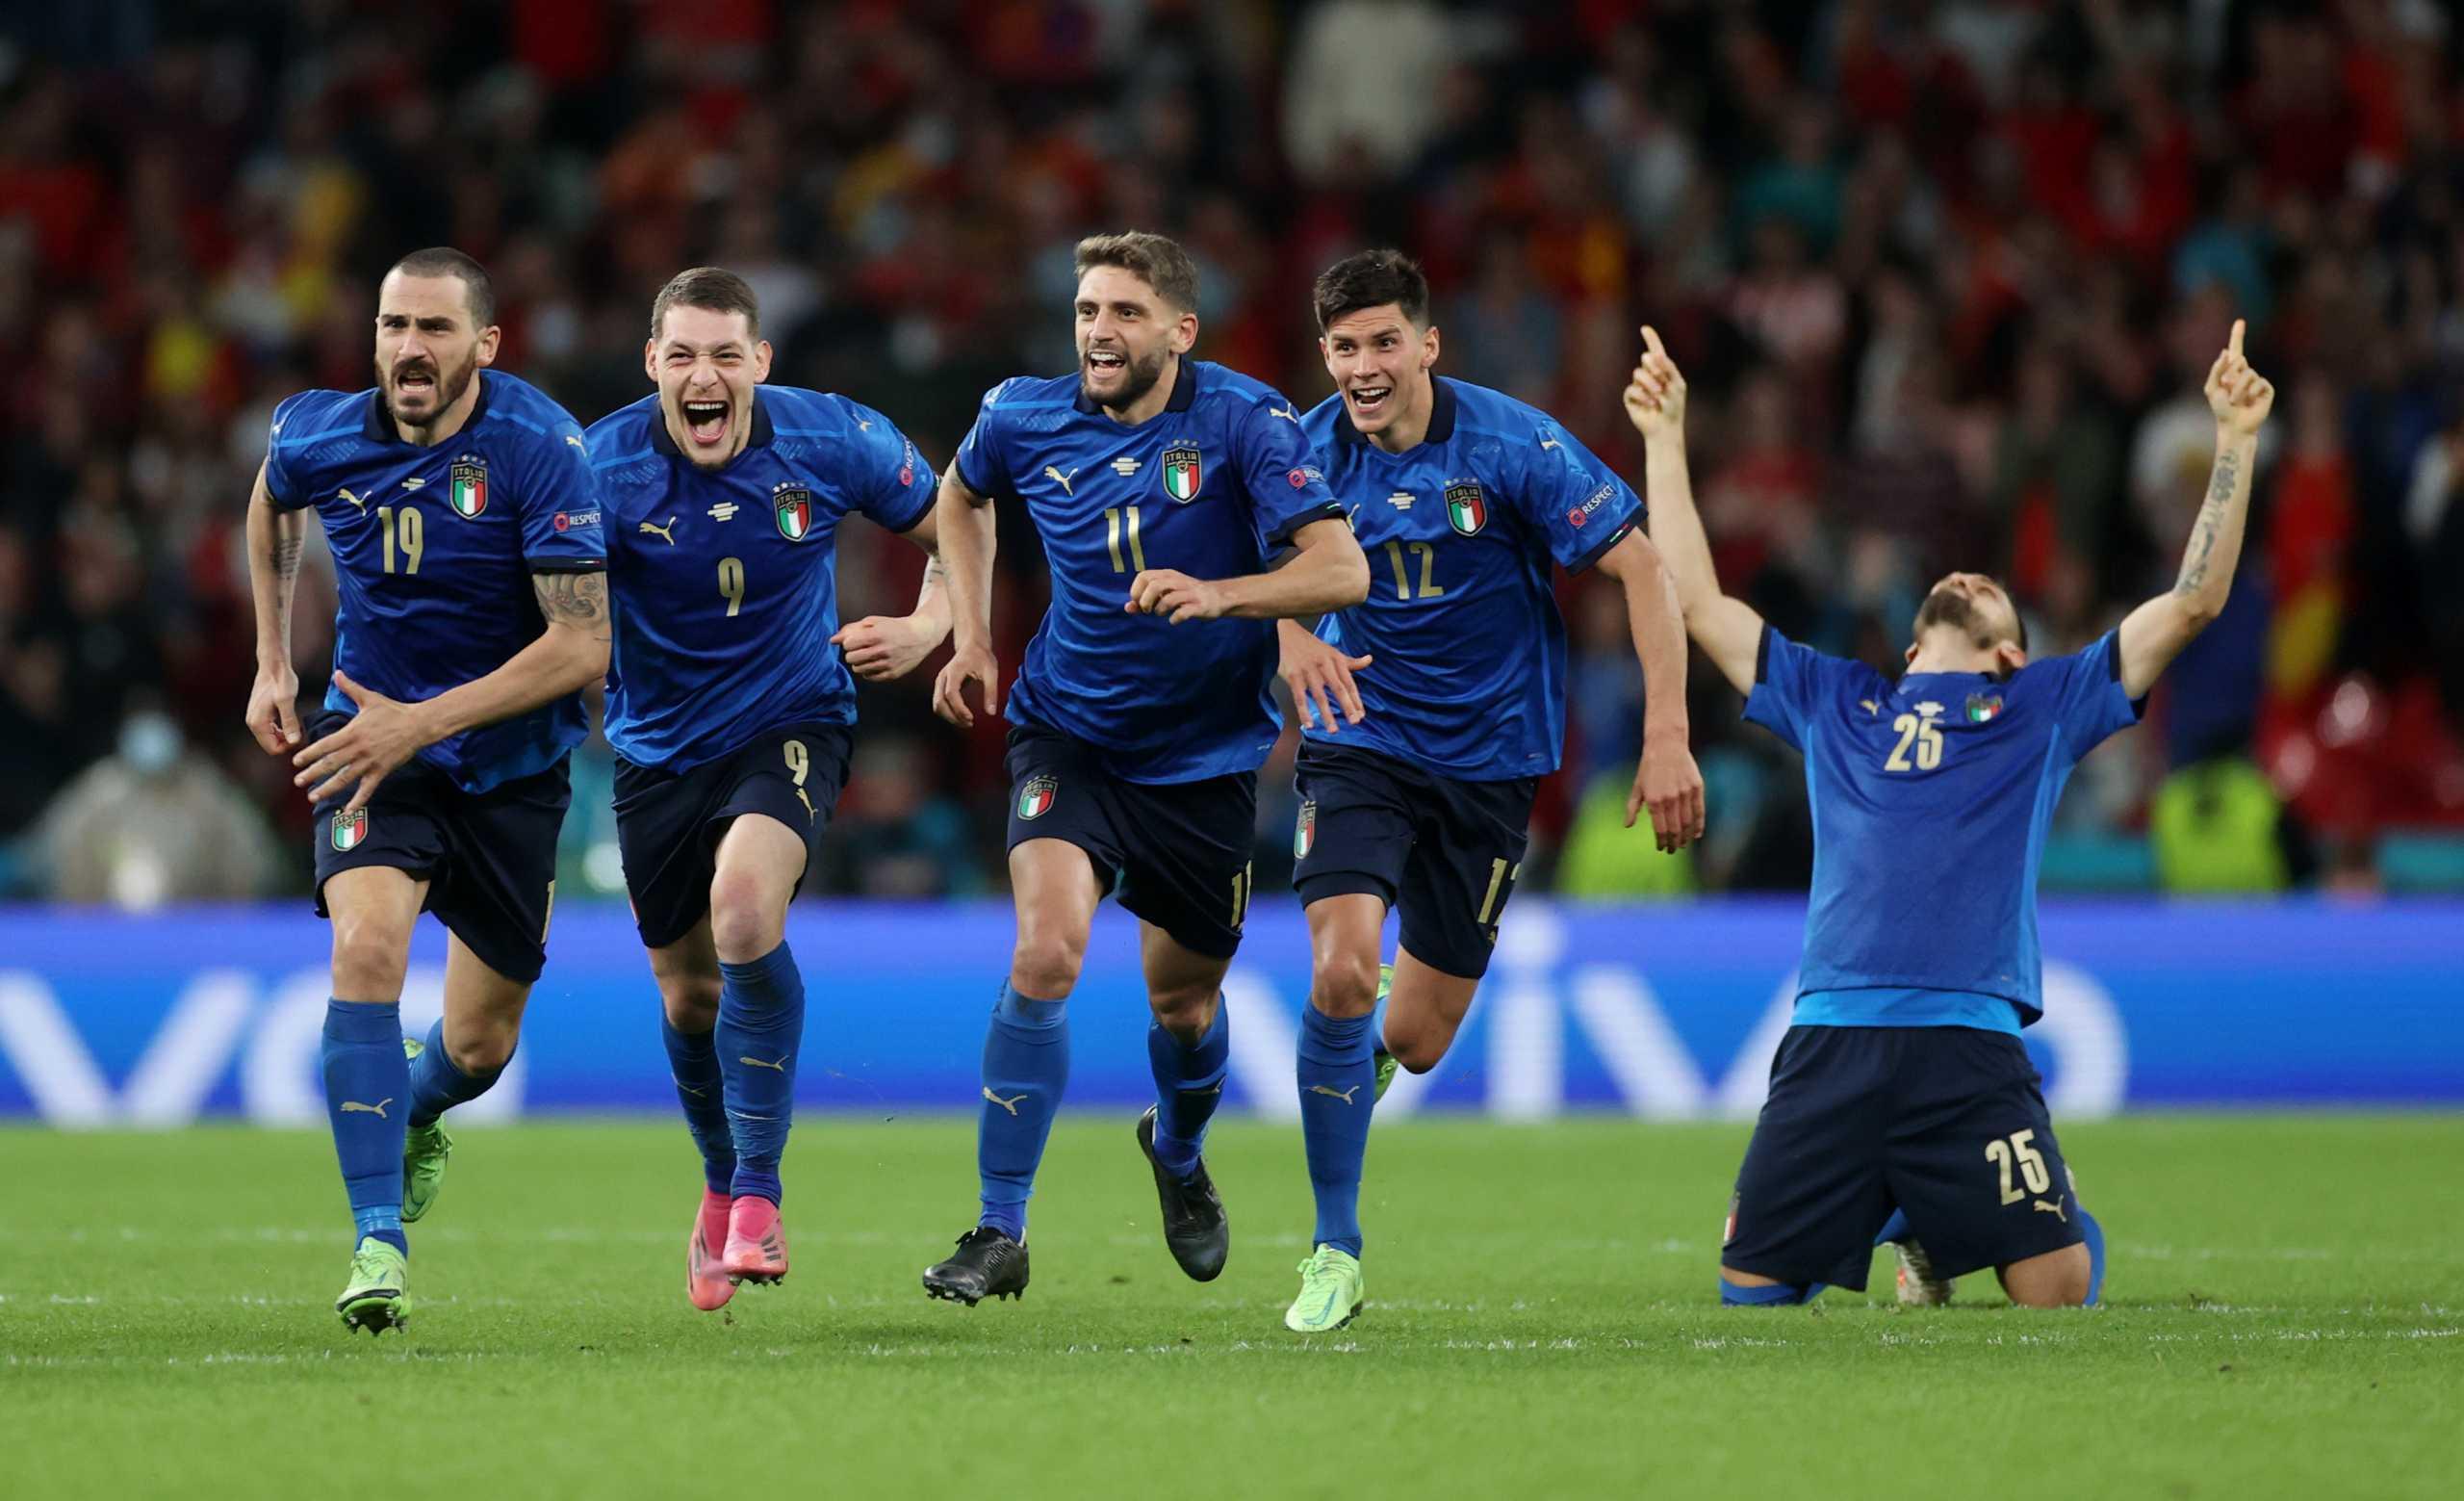 Euro 2020, Ιταλία – Ισπανία: Τα highlights της πρόκρισης των «ατζούρι» στον τελικό